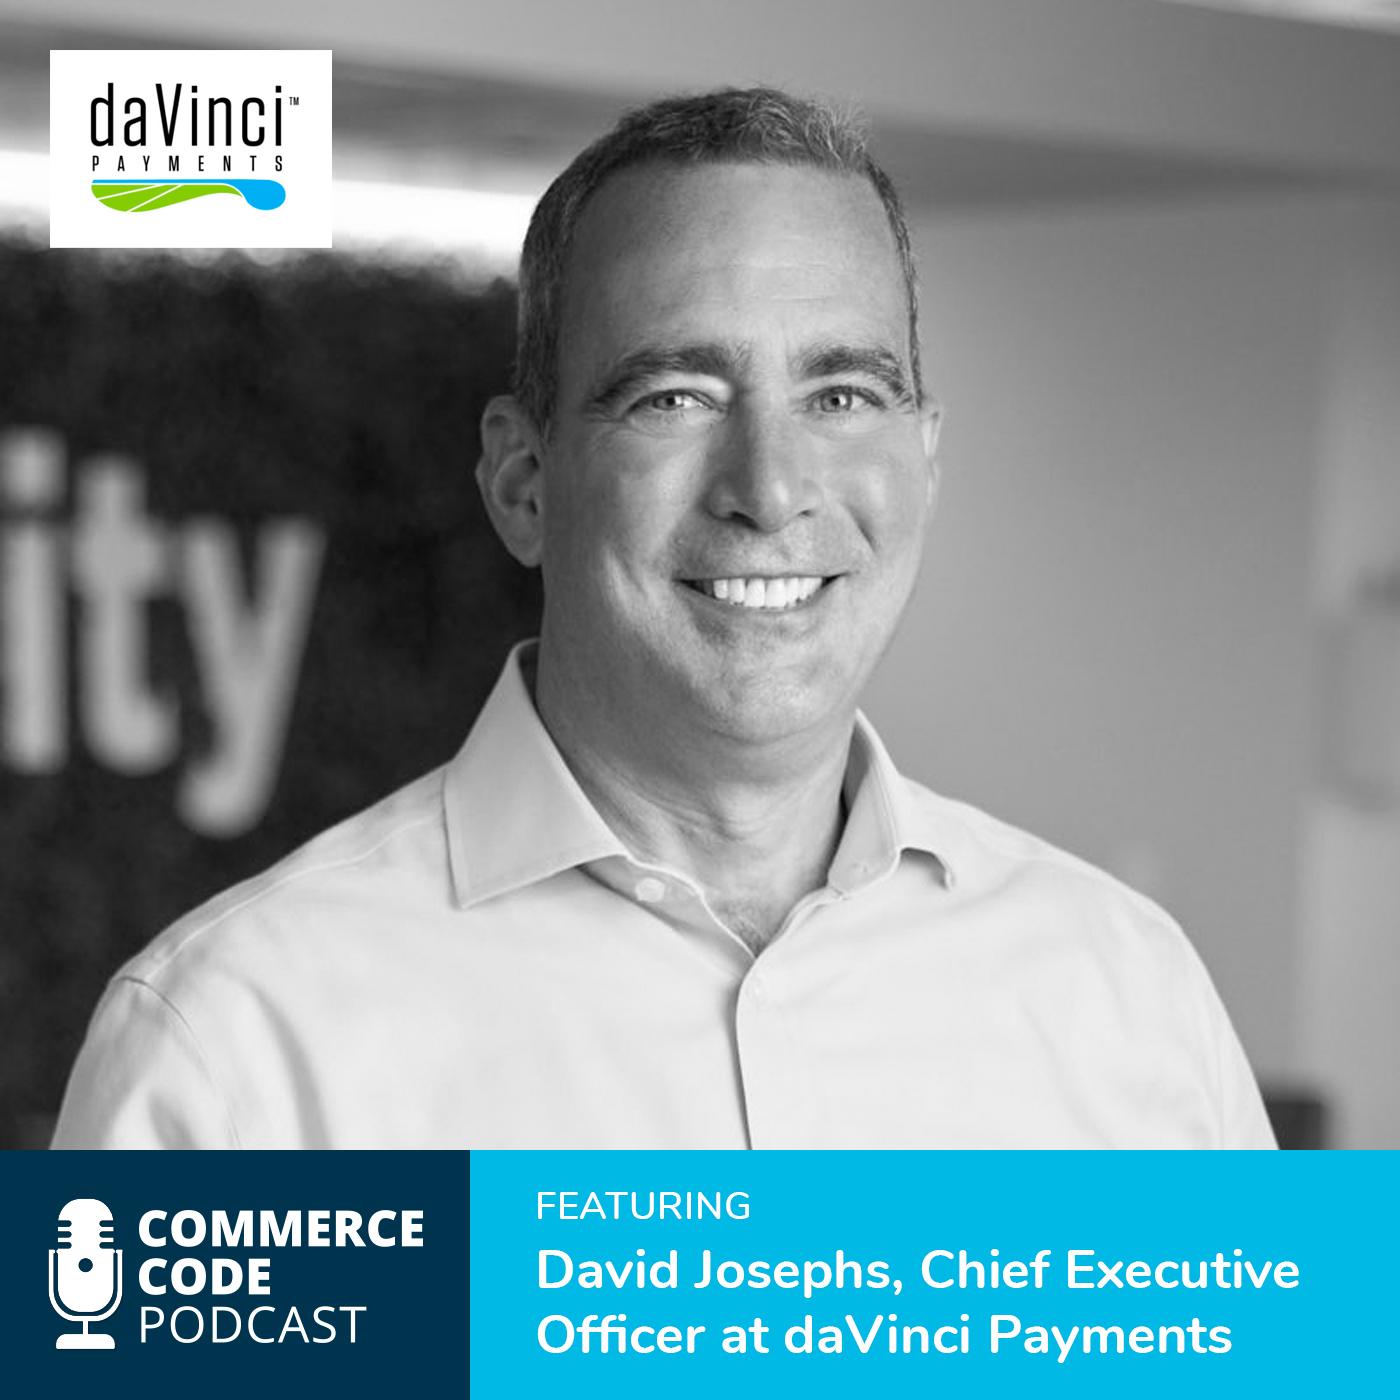 commerce code david josephs